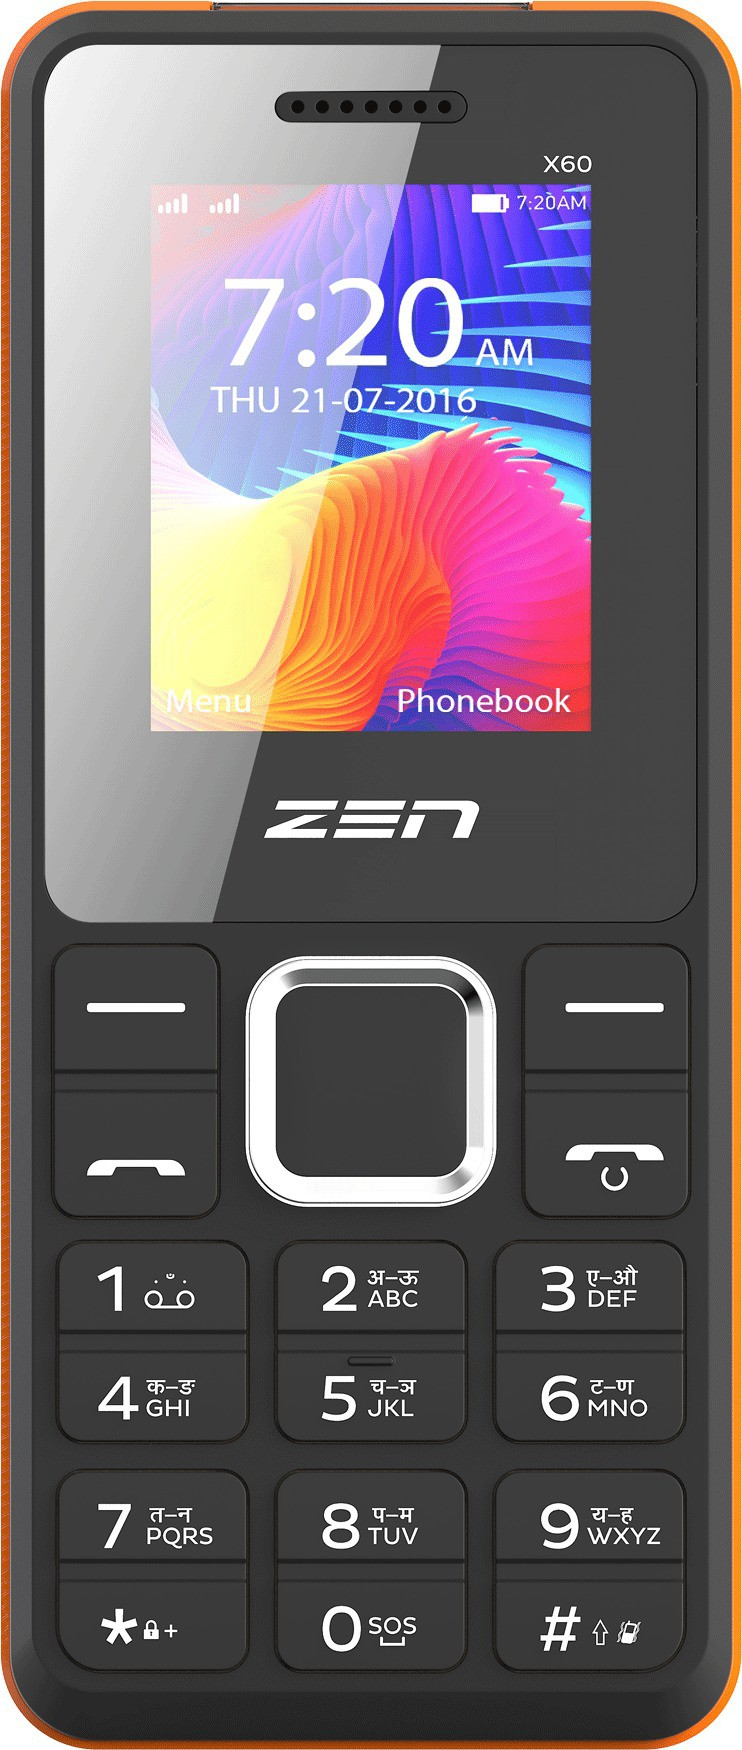 Zen Power 101 X60(Black & Orange)